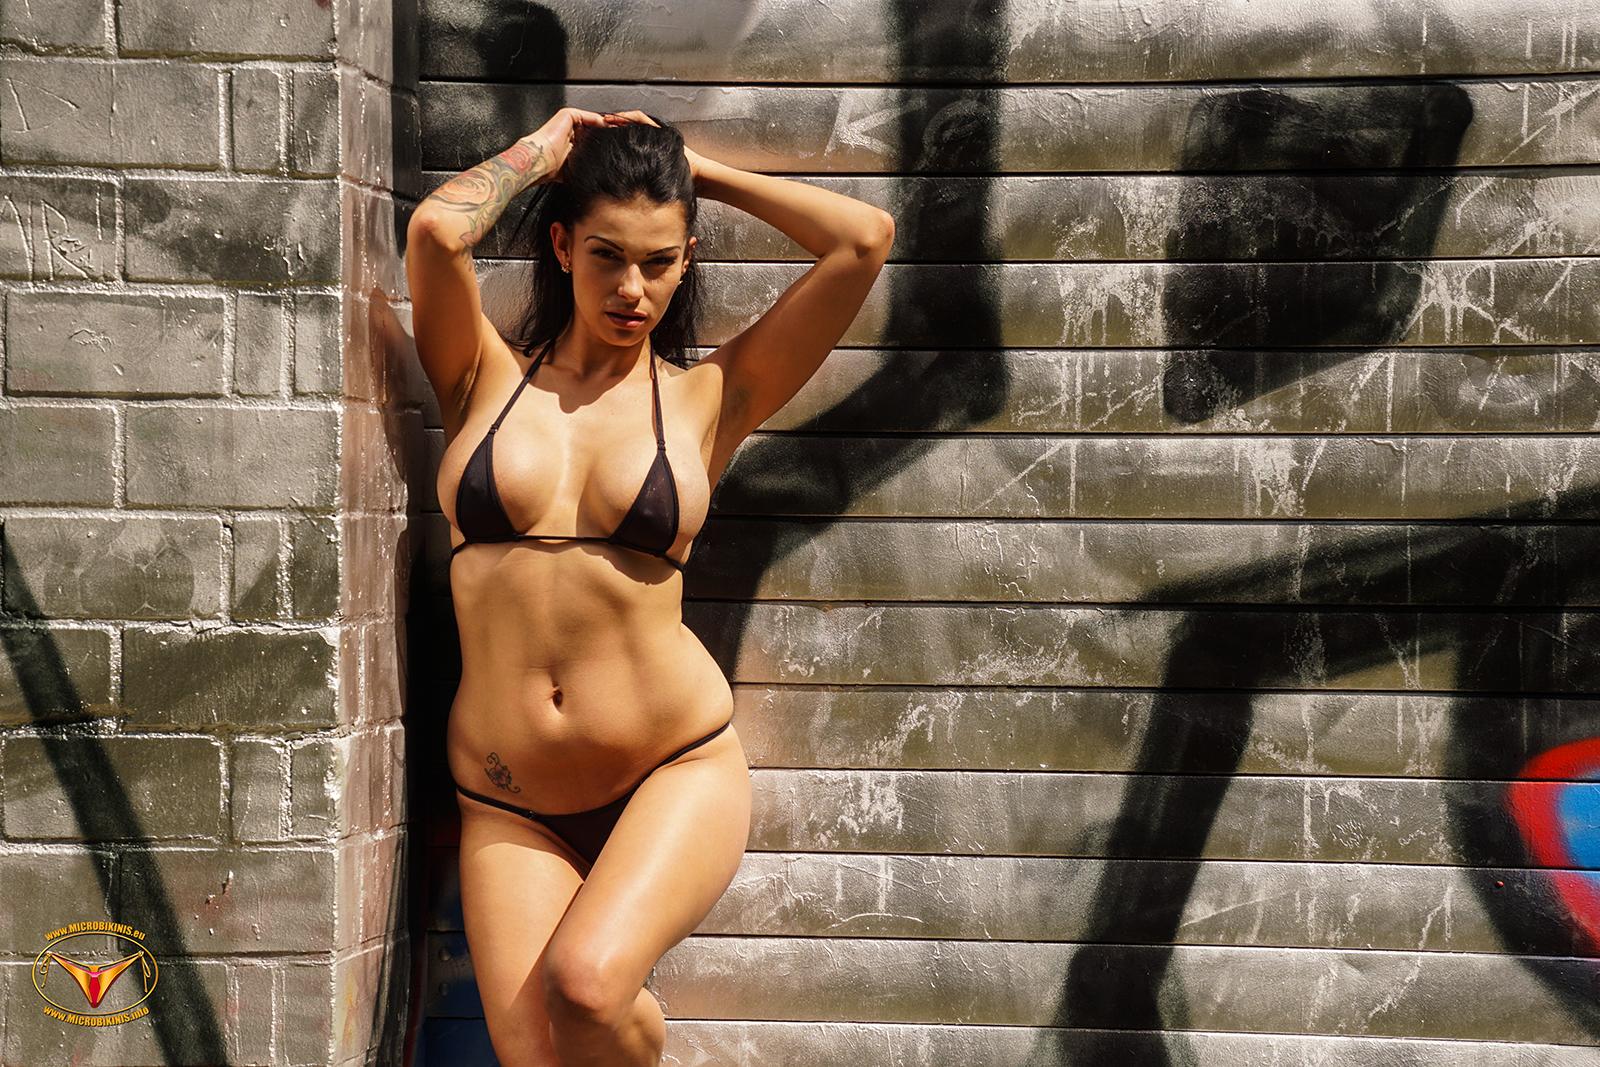 Microbikinis Bikinigirl, Micro Bikini Model Irca Bikinigirl from Berlin